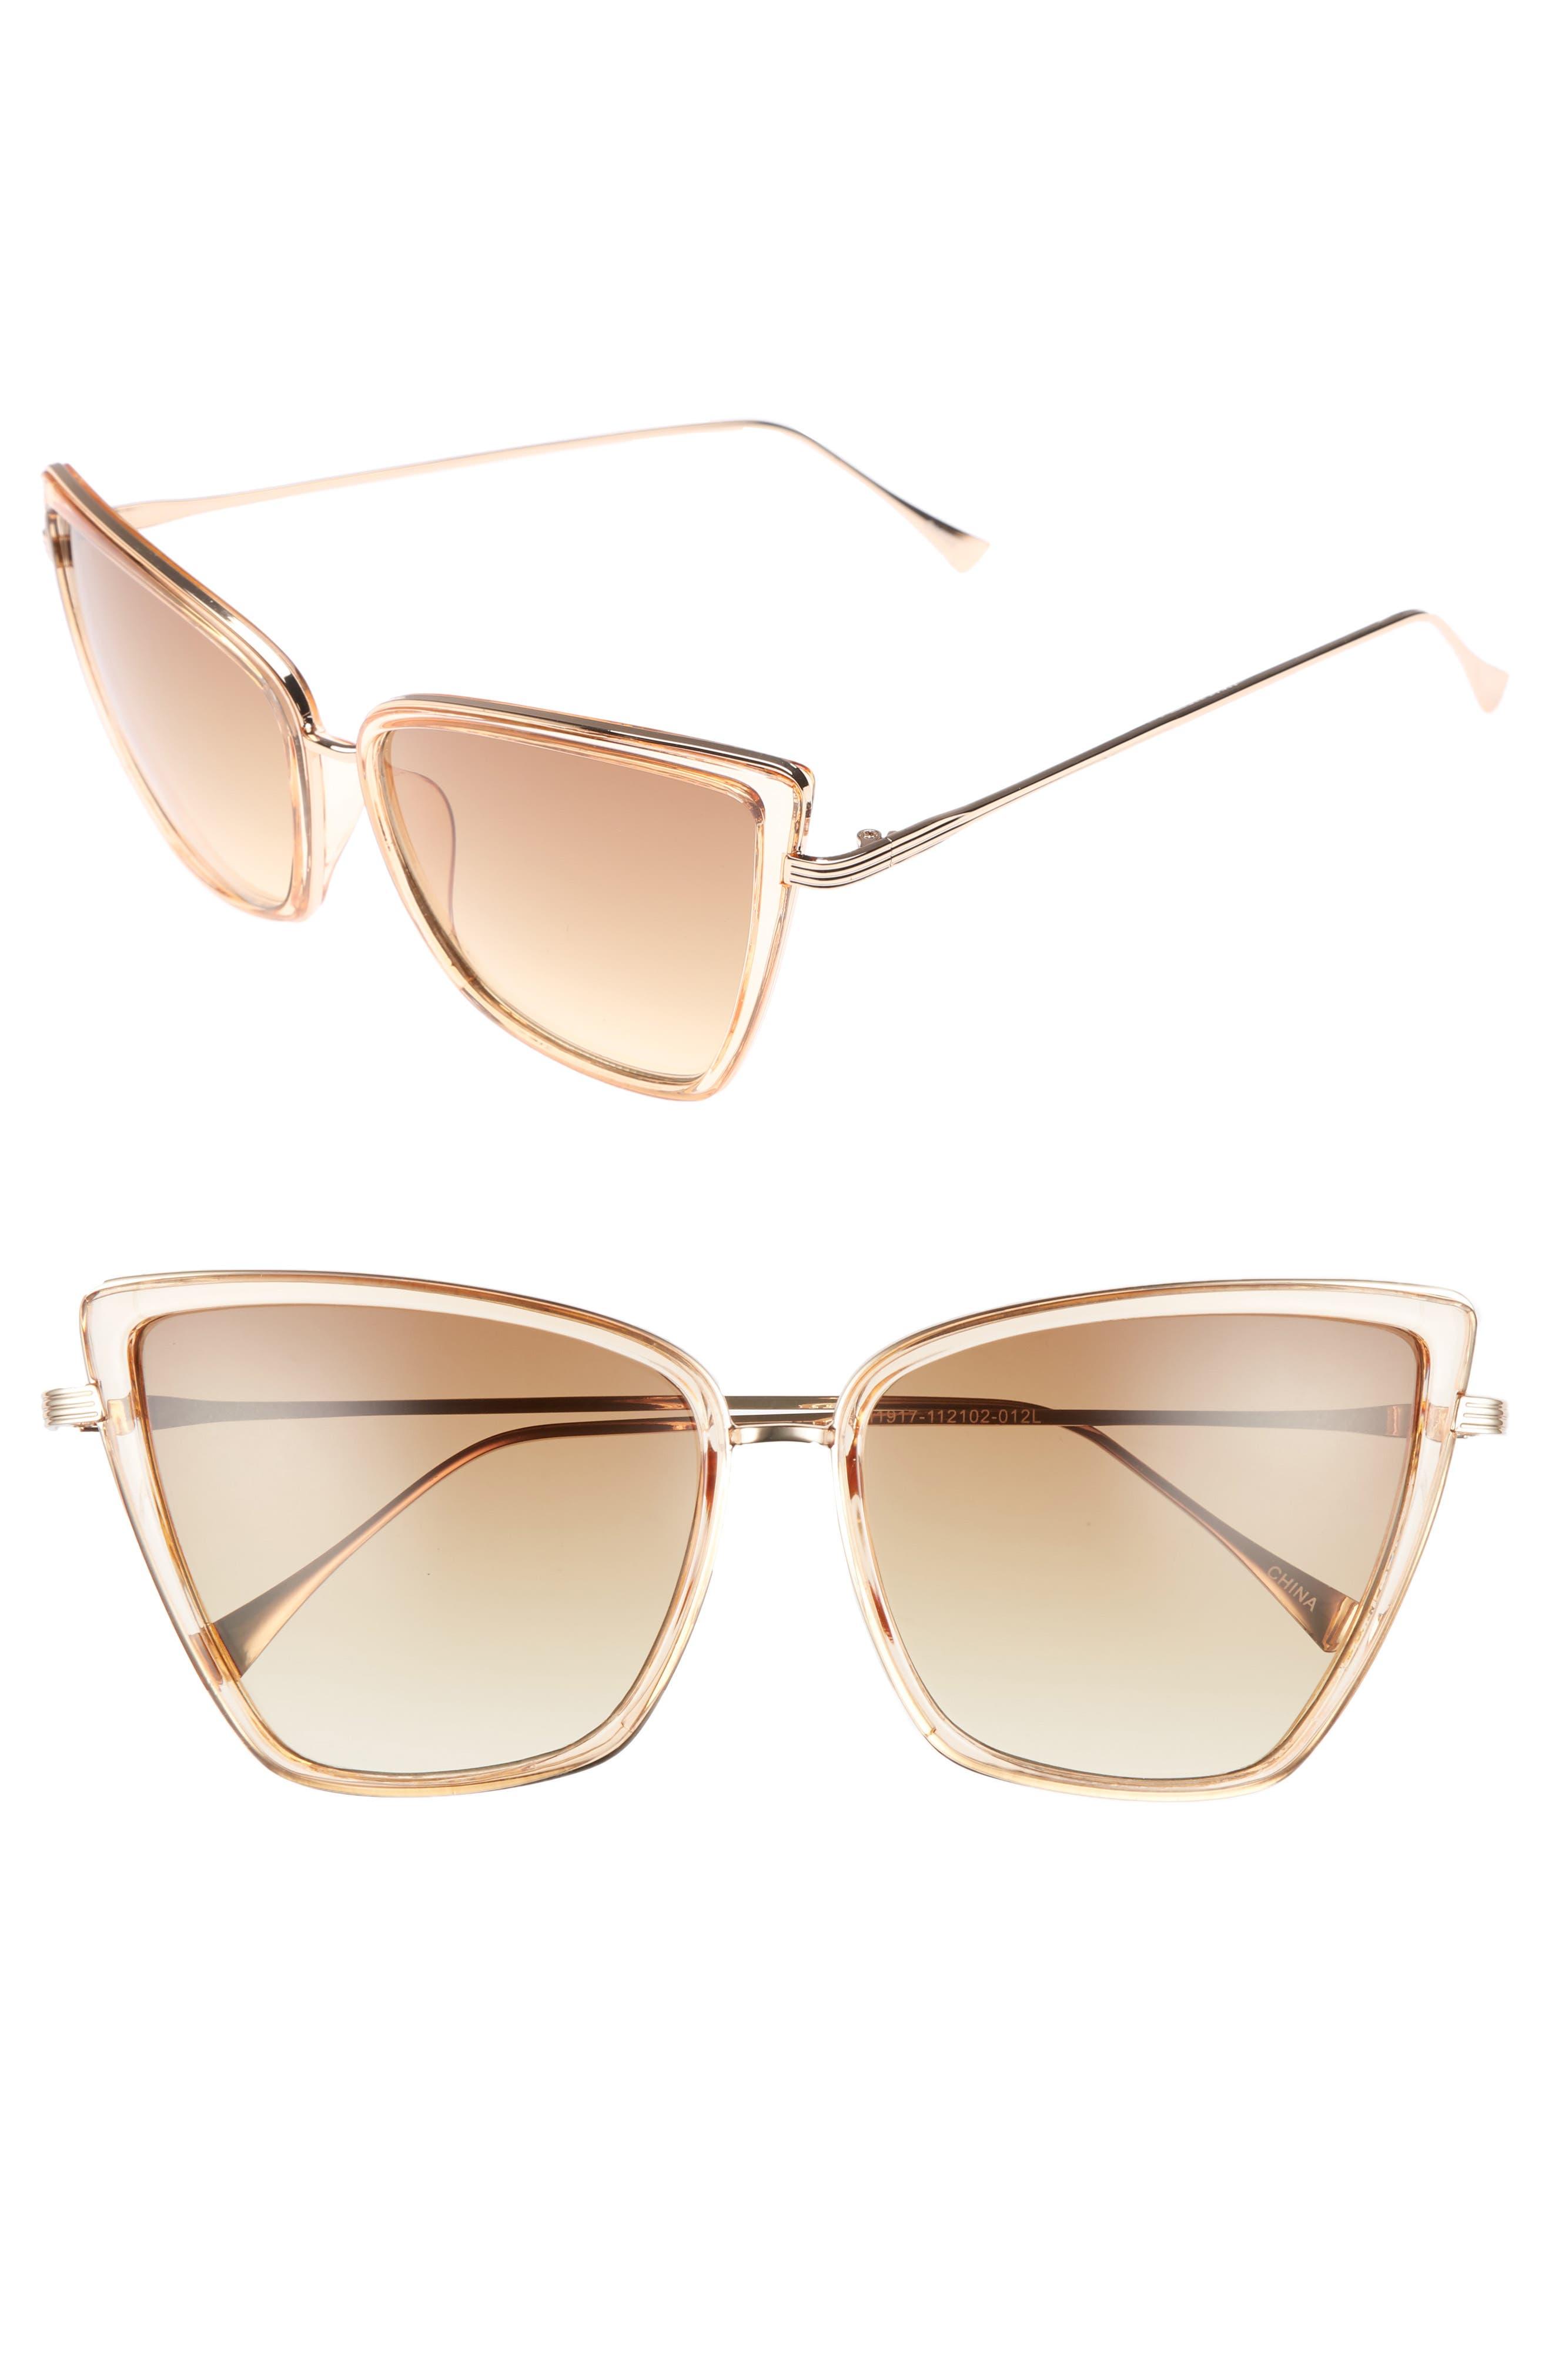 Main Image - Leith 55mm Cat Eye Sunglasses